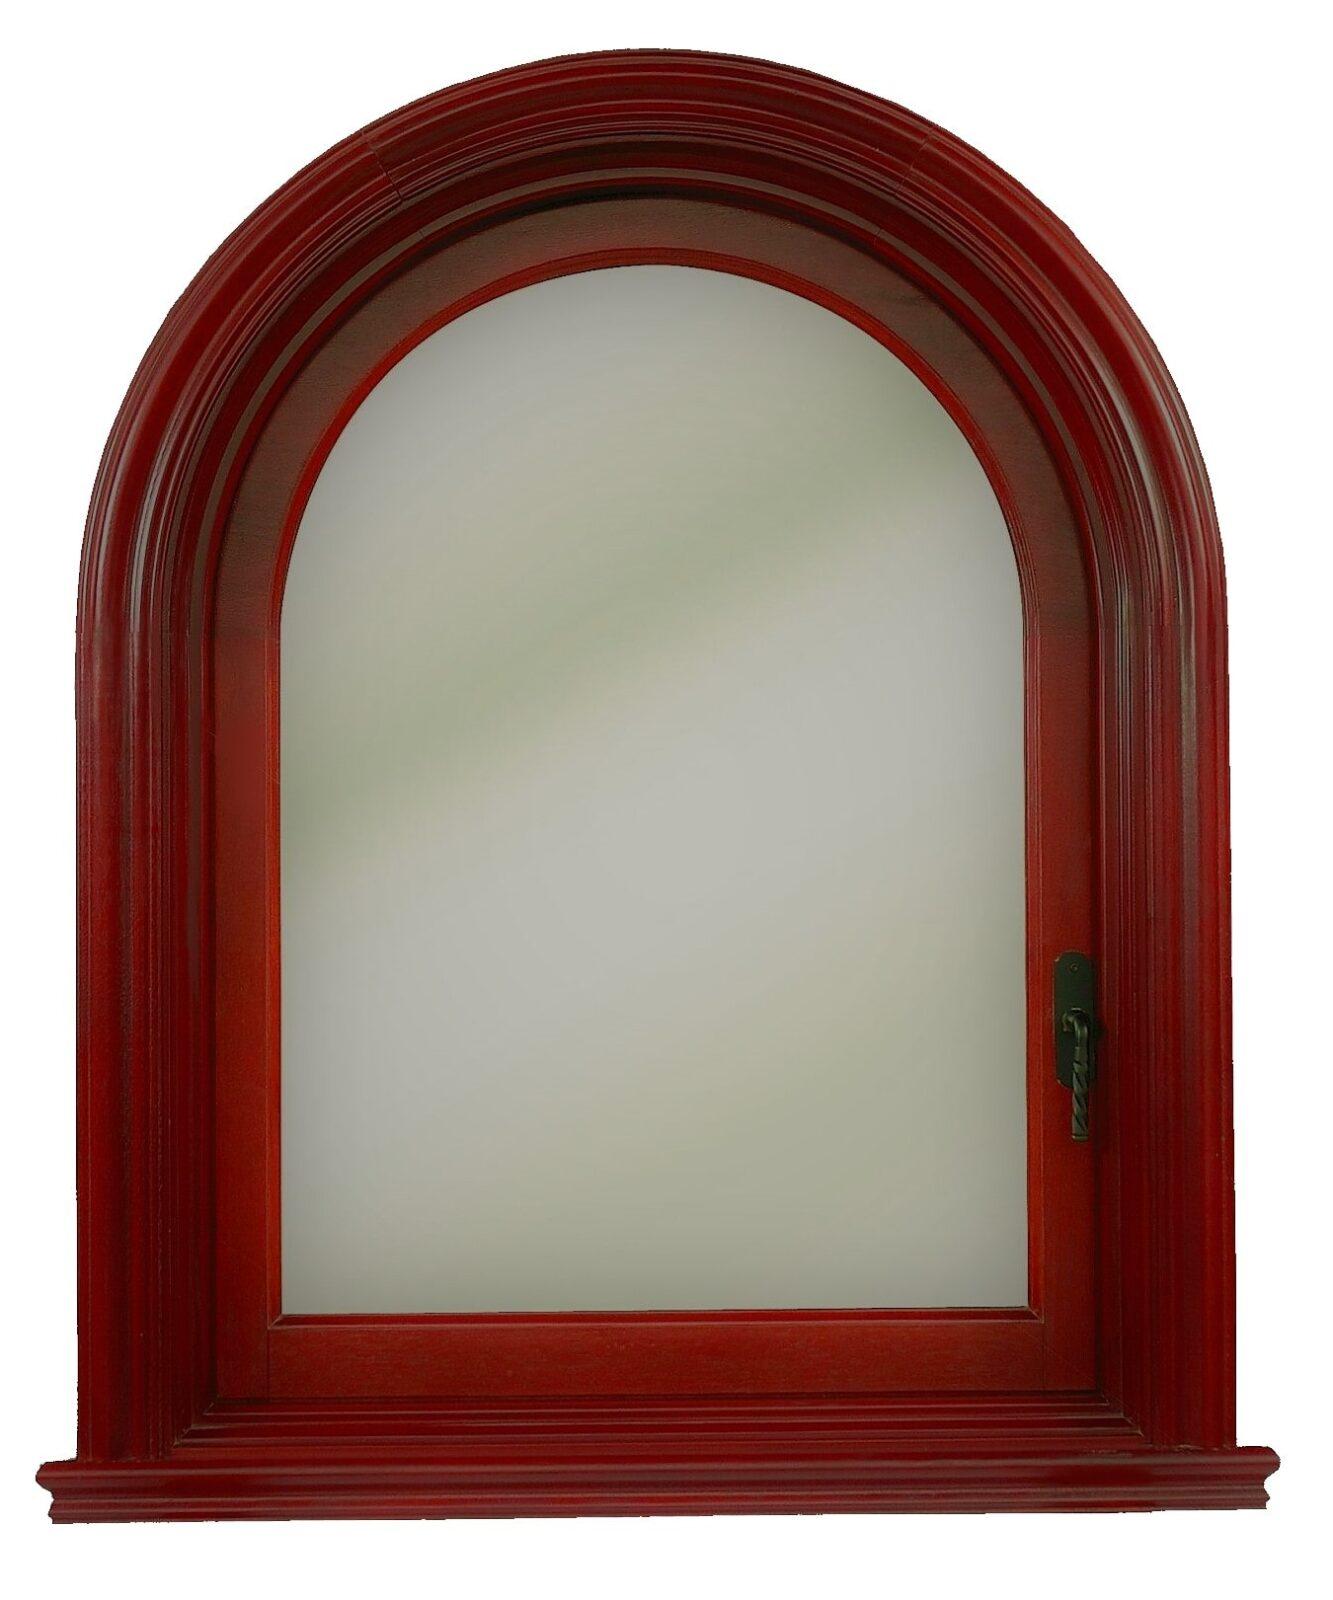 SAN PEDRO ARCHED MAHOGANY CASEMENT WINDOW